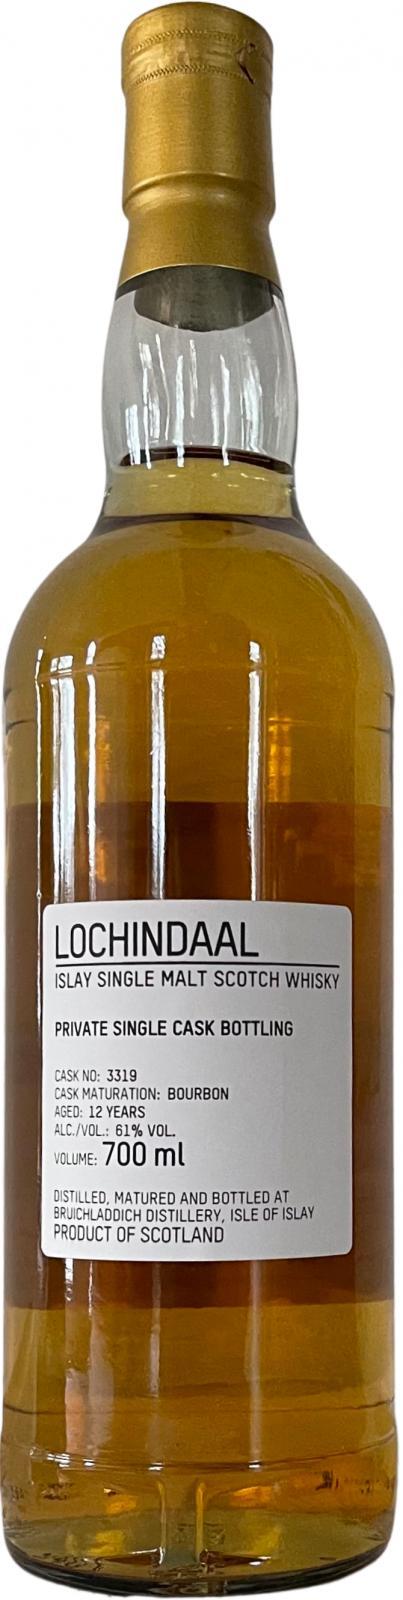 Lochindaal 12-year-old